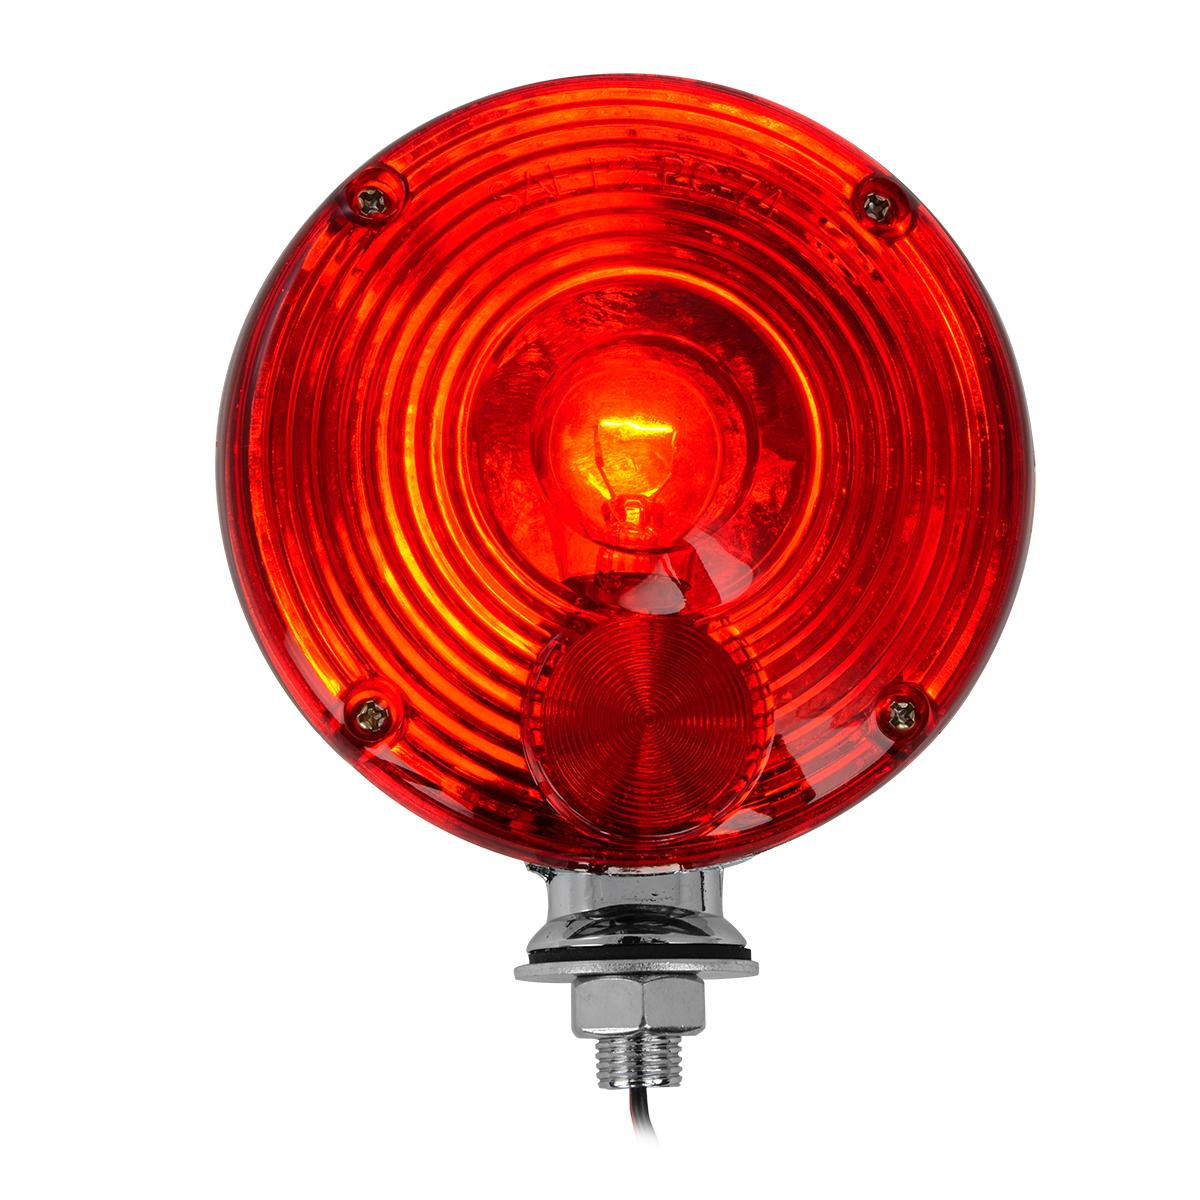 "#80324 4"" Single Face Light Duty Pedestal Red Light"